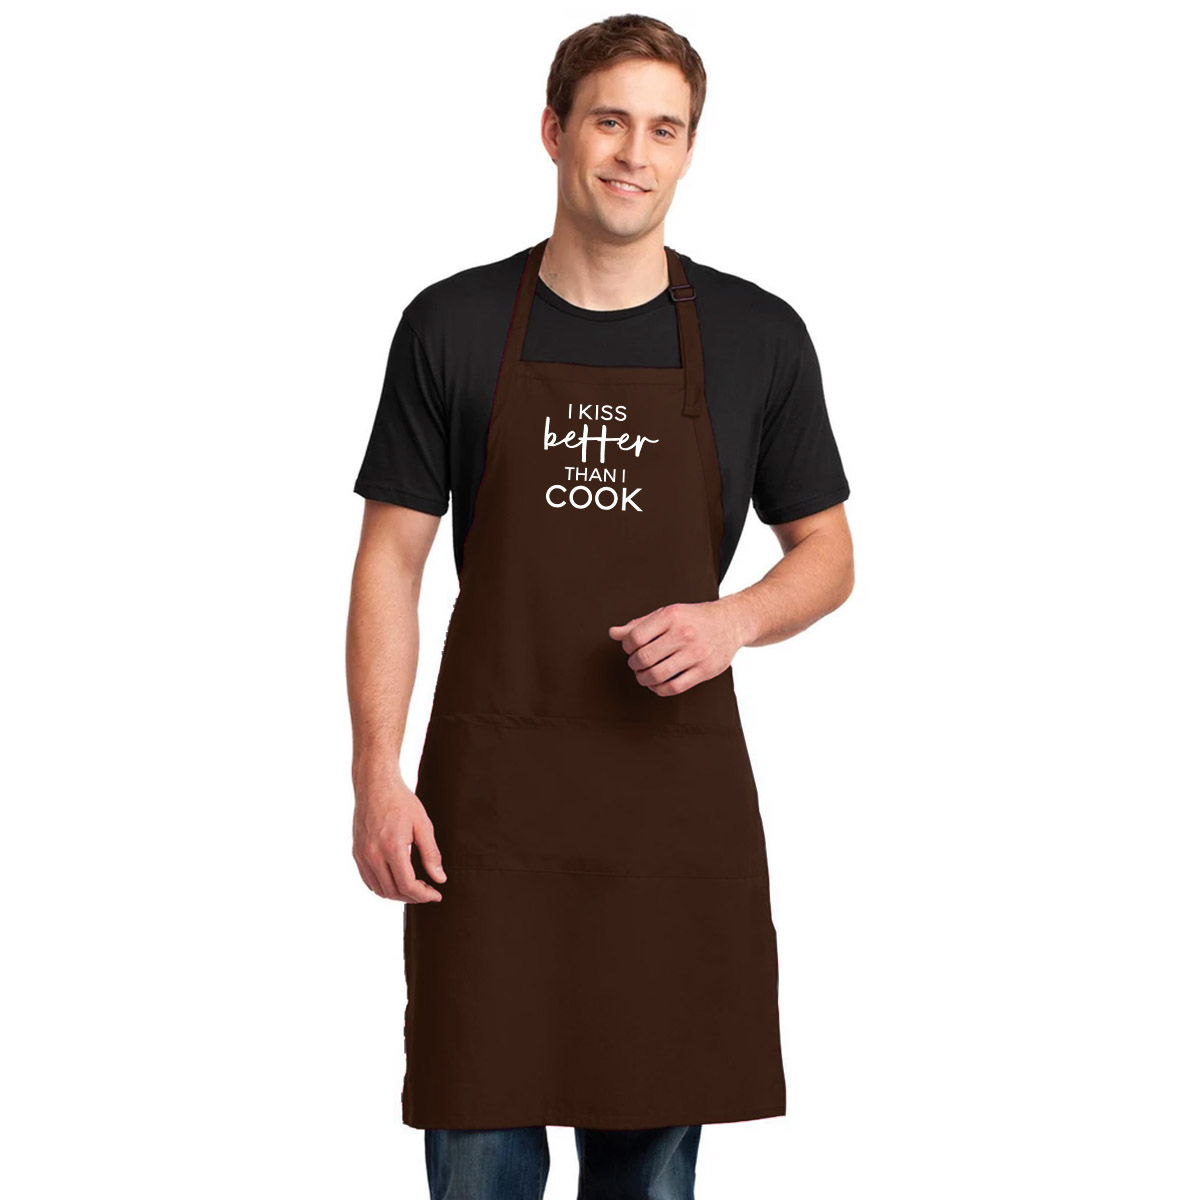 Tạp Dề Làm Bếp In Hình I Kiss Better Than I Cook Funny Grilling Baking Food